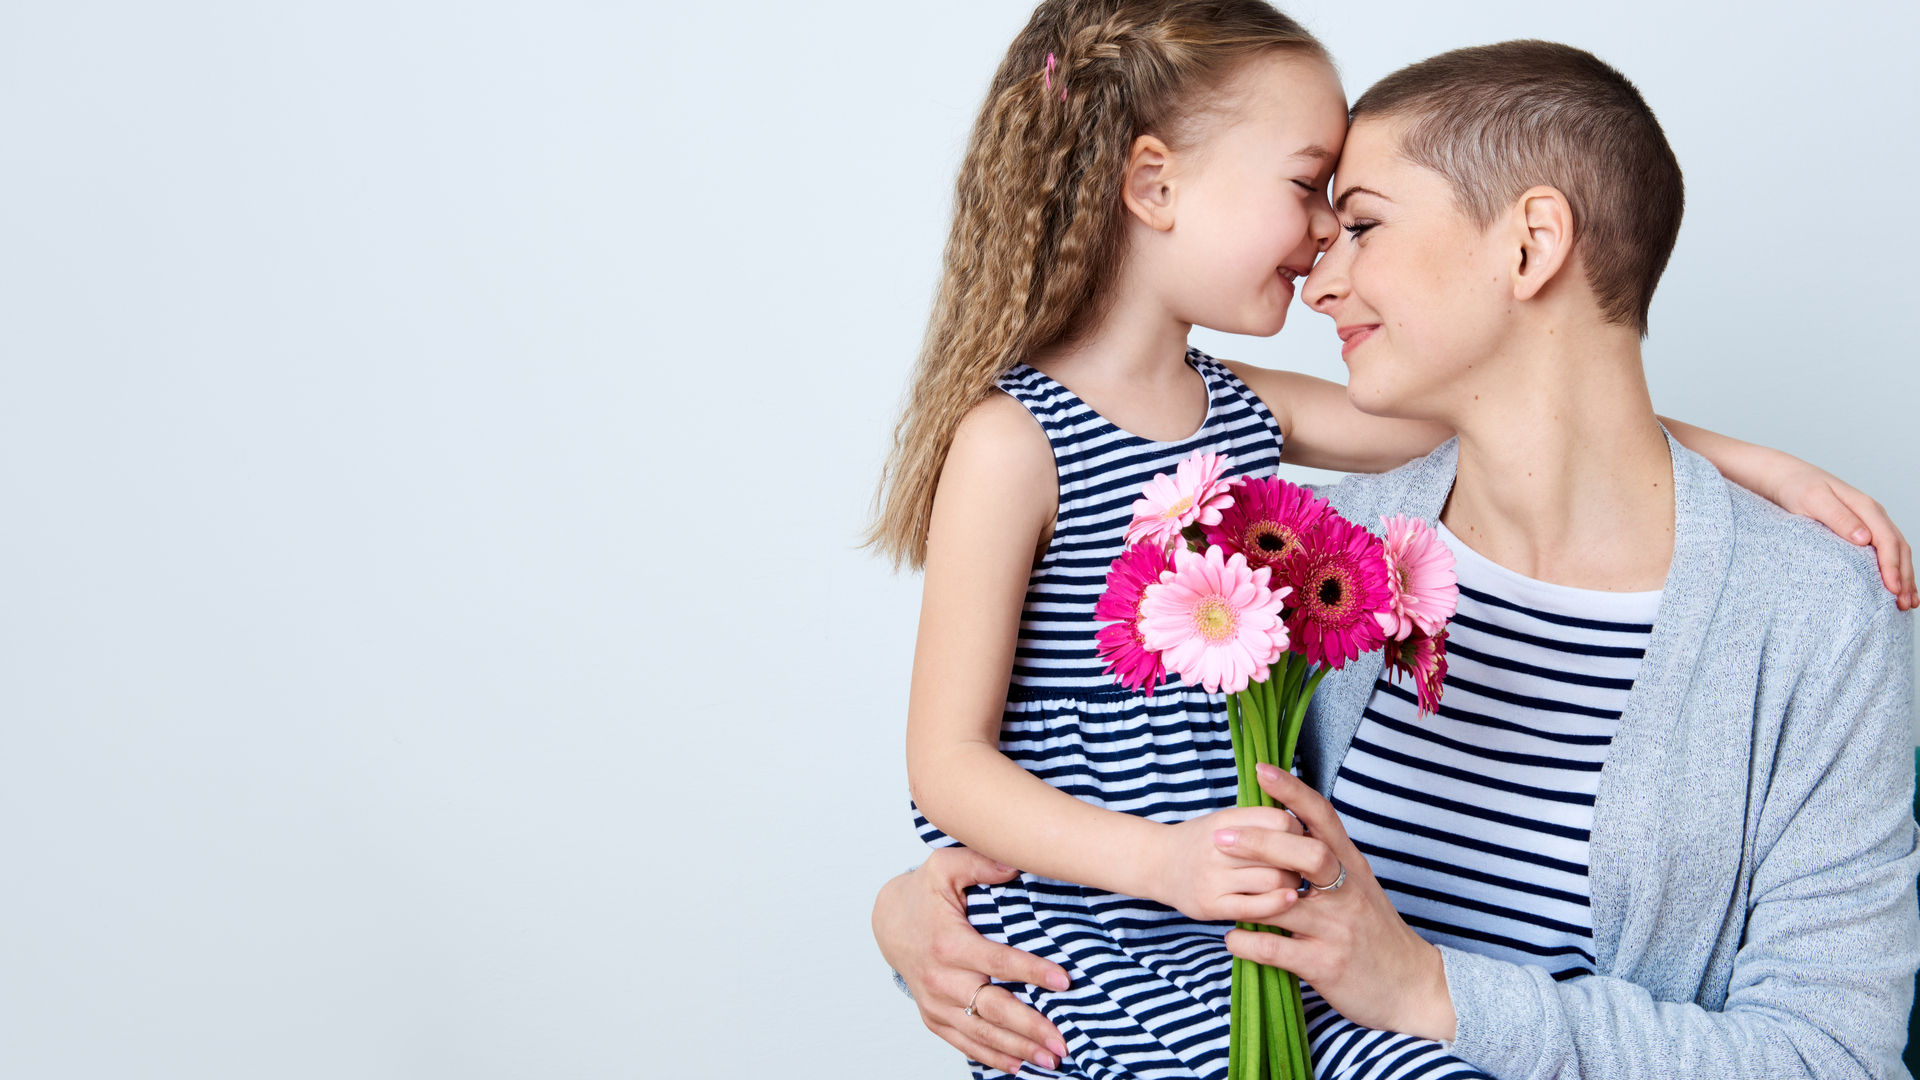 5 tips para mantenerte saludable si eres superviviente del cáncer